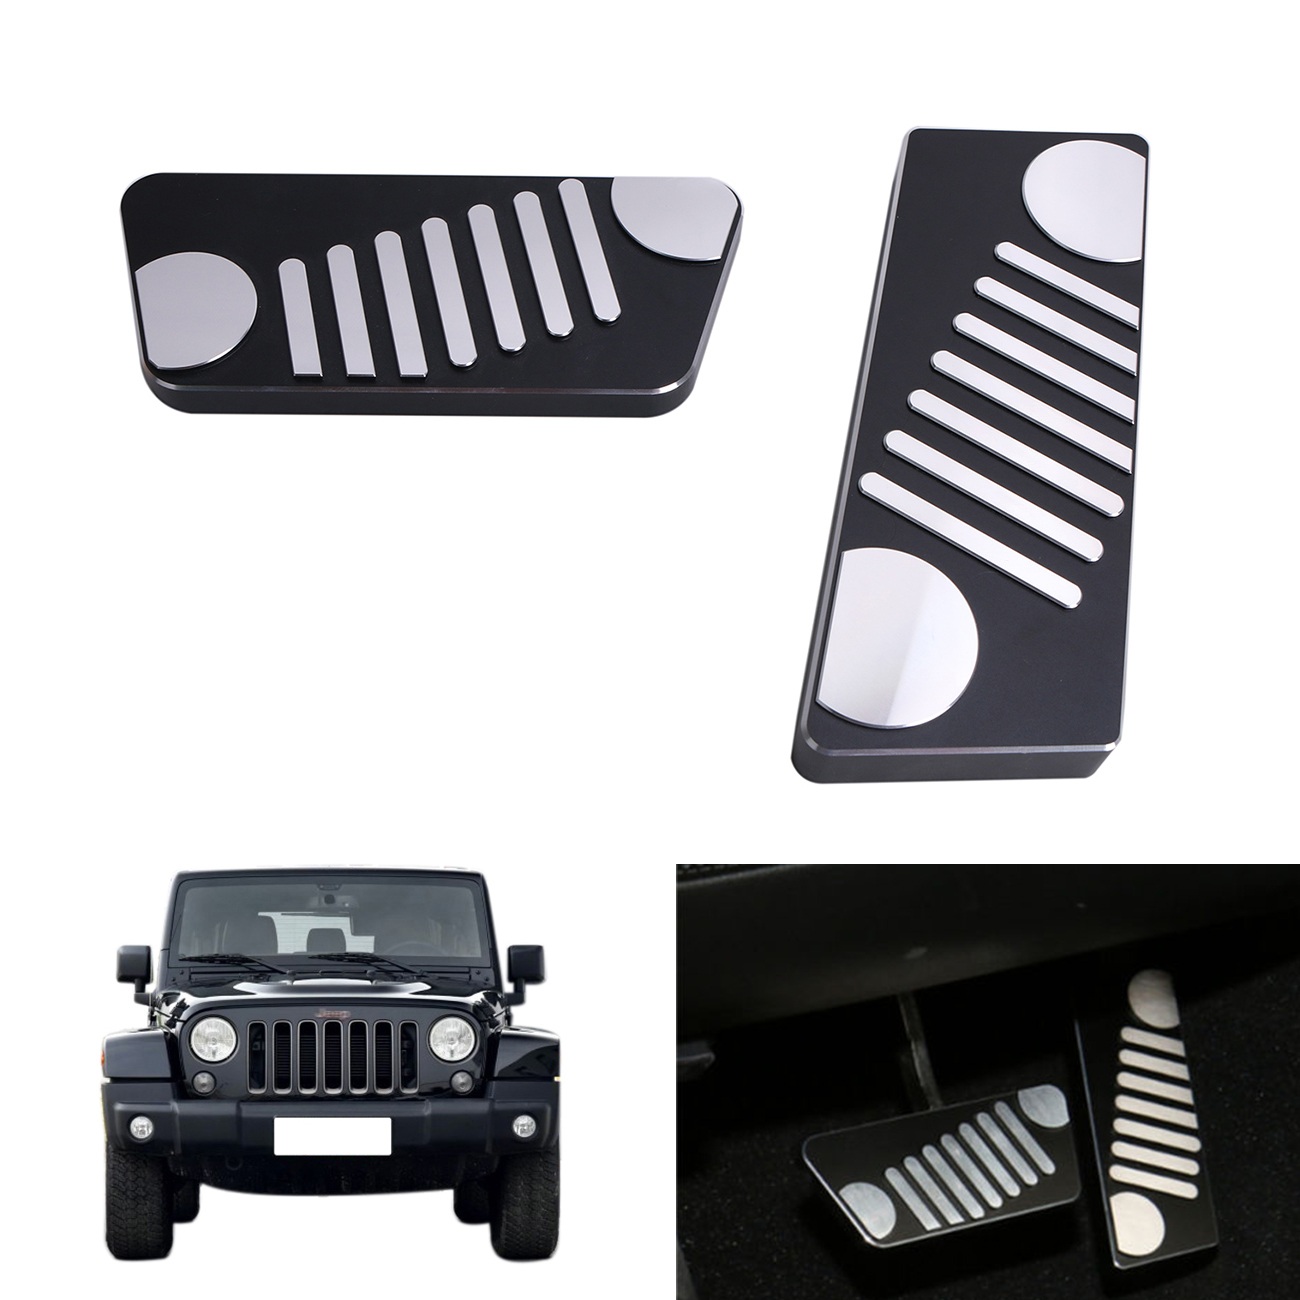 black aluminum alloy accelerator gas brake pedal kit for jeep wrangler jk rubicon sahara sport 2009 2016 left hand drive ce037 [ 1300 x 1300 Pixel ]